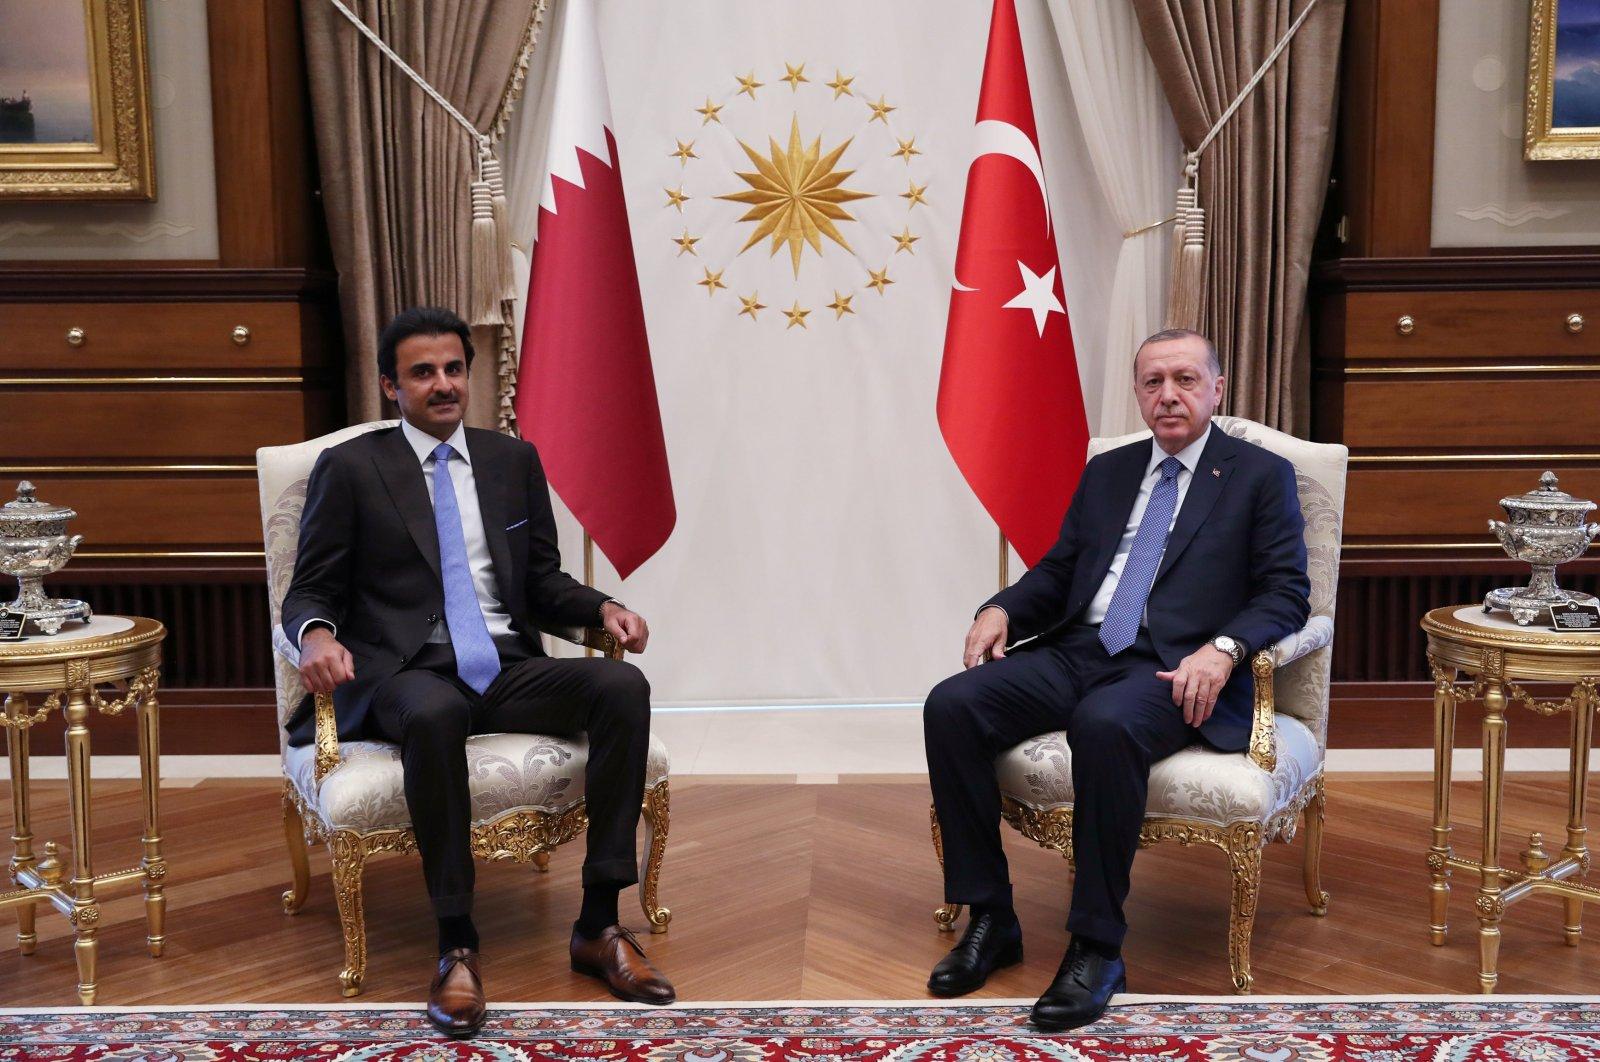 President Recep Tayyip Erdoğan and Qatari Emir Tamim bin Hamad Al Thani in Ankara, Turkey, Aug. 15, 2018. (Reuters Photo)